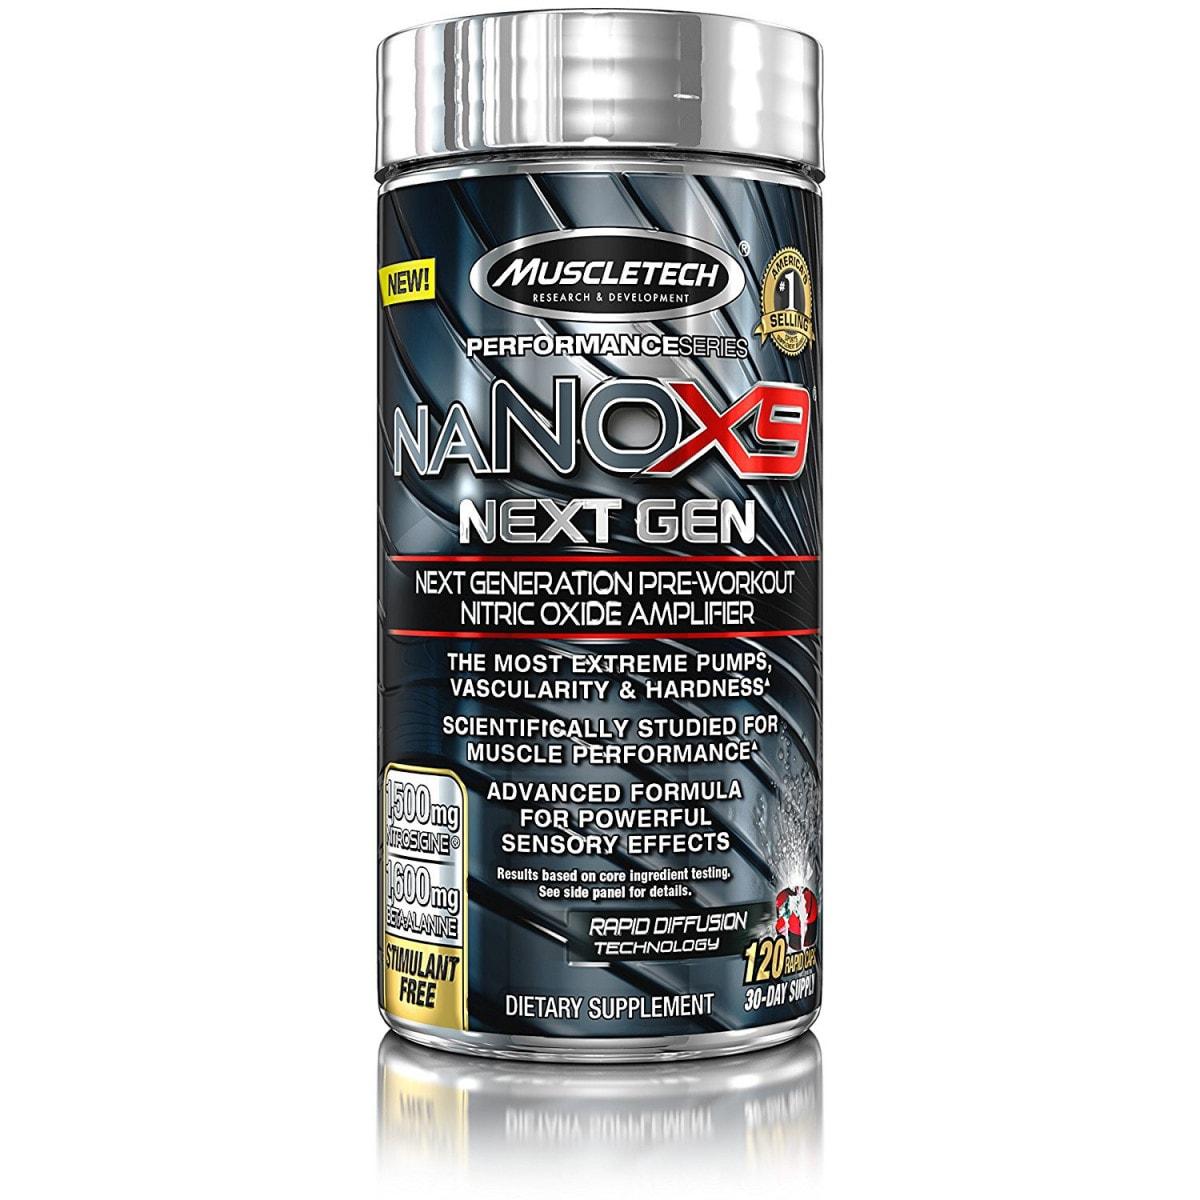 NANOX9 NEXT GEN (151g)